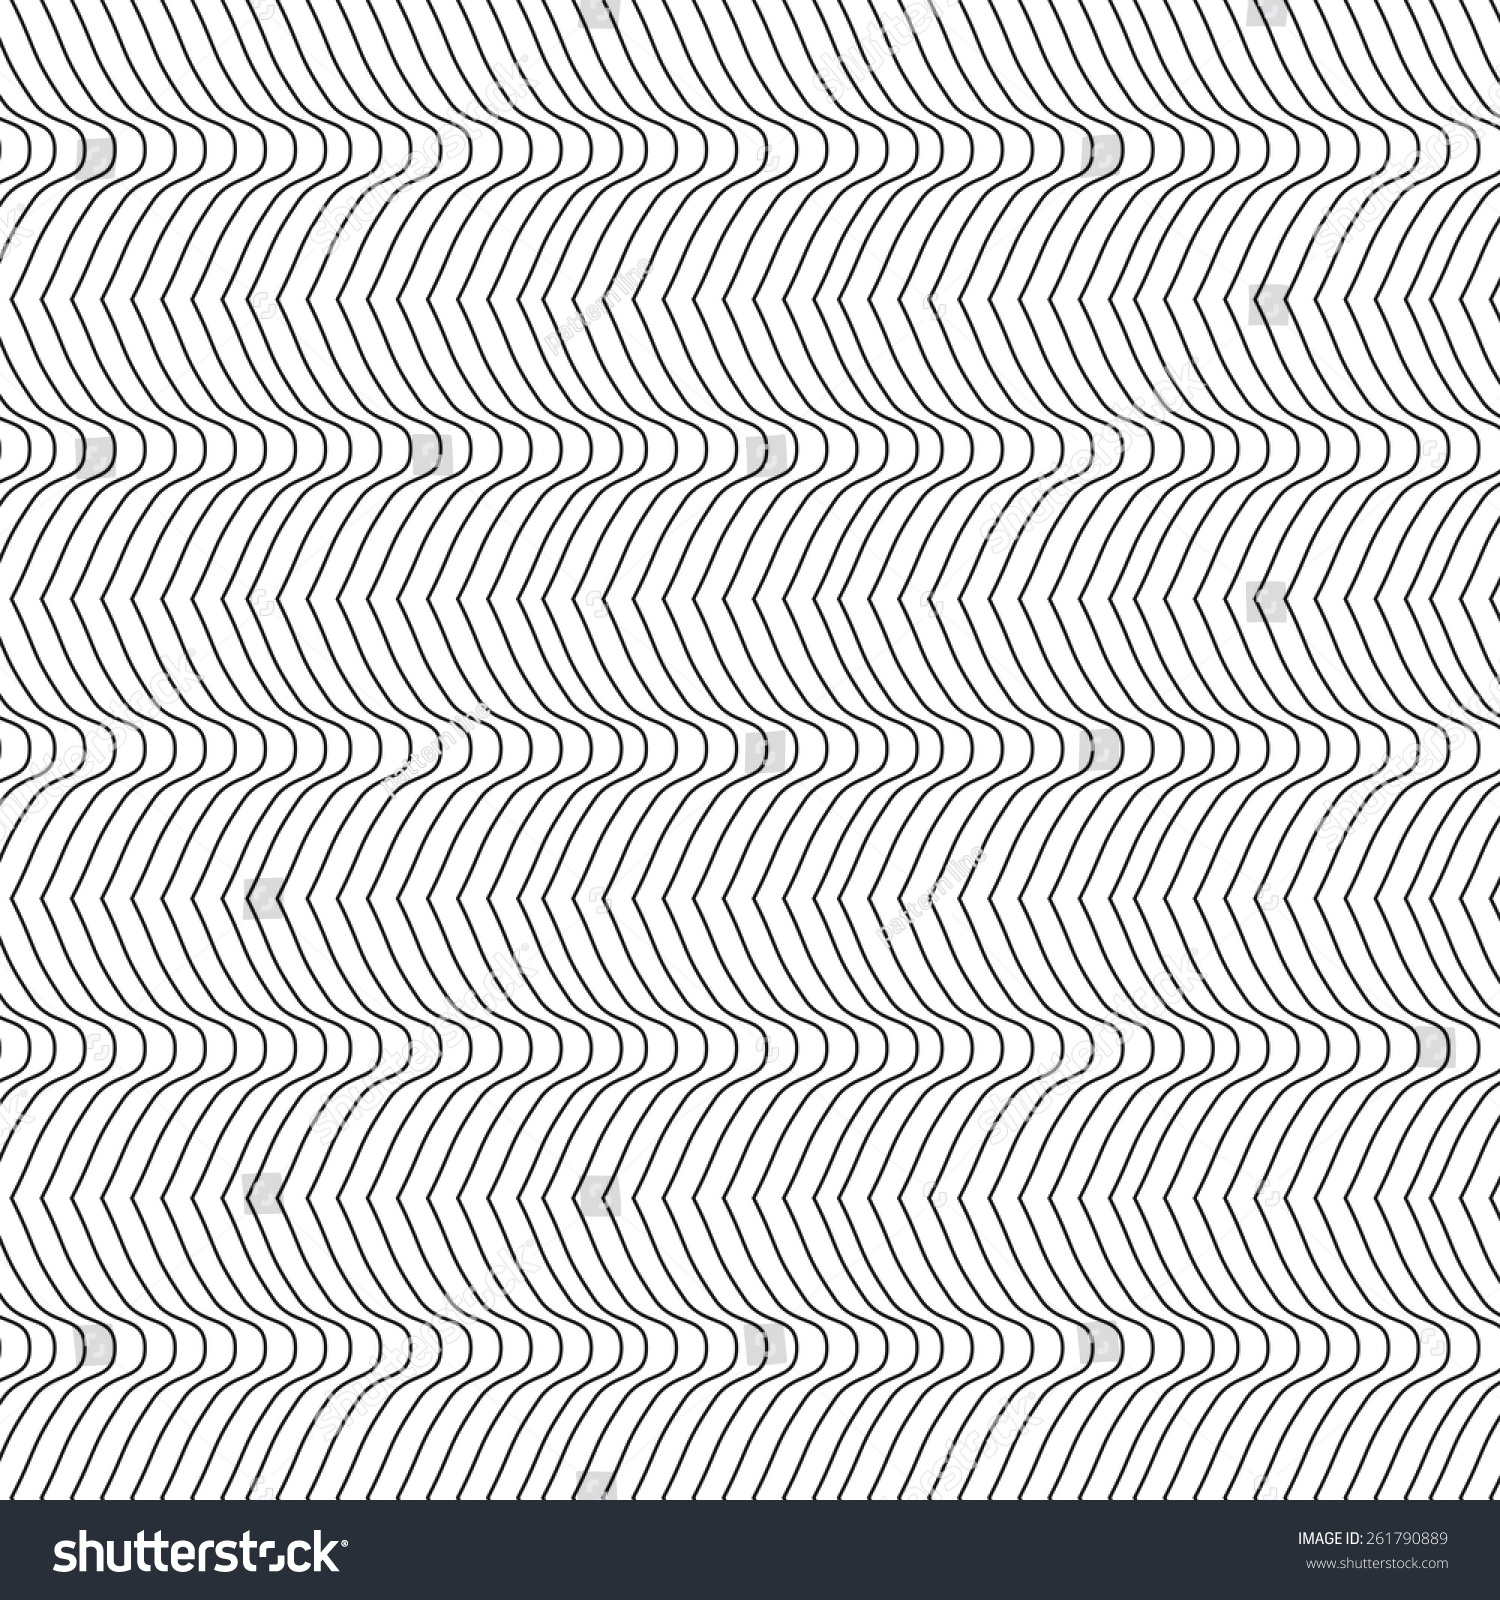 Line Texture Seamless : Black line vector seamless pattern modern stock